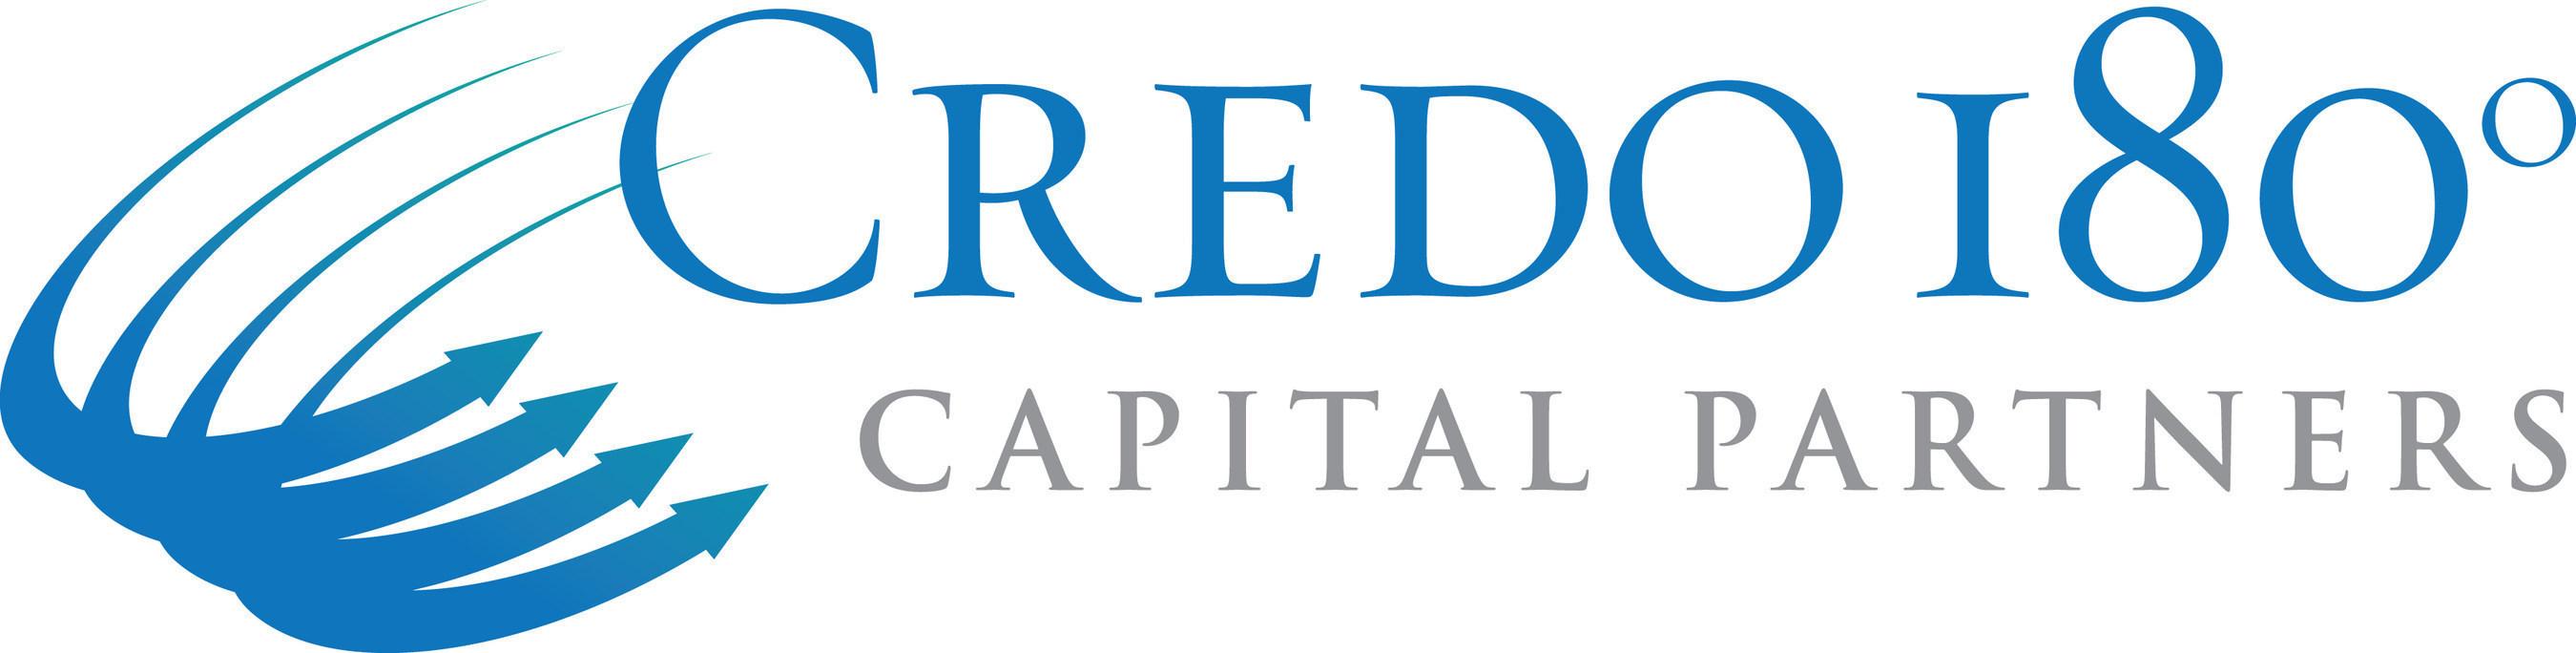 Credo 180 Capital Partners Logo